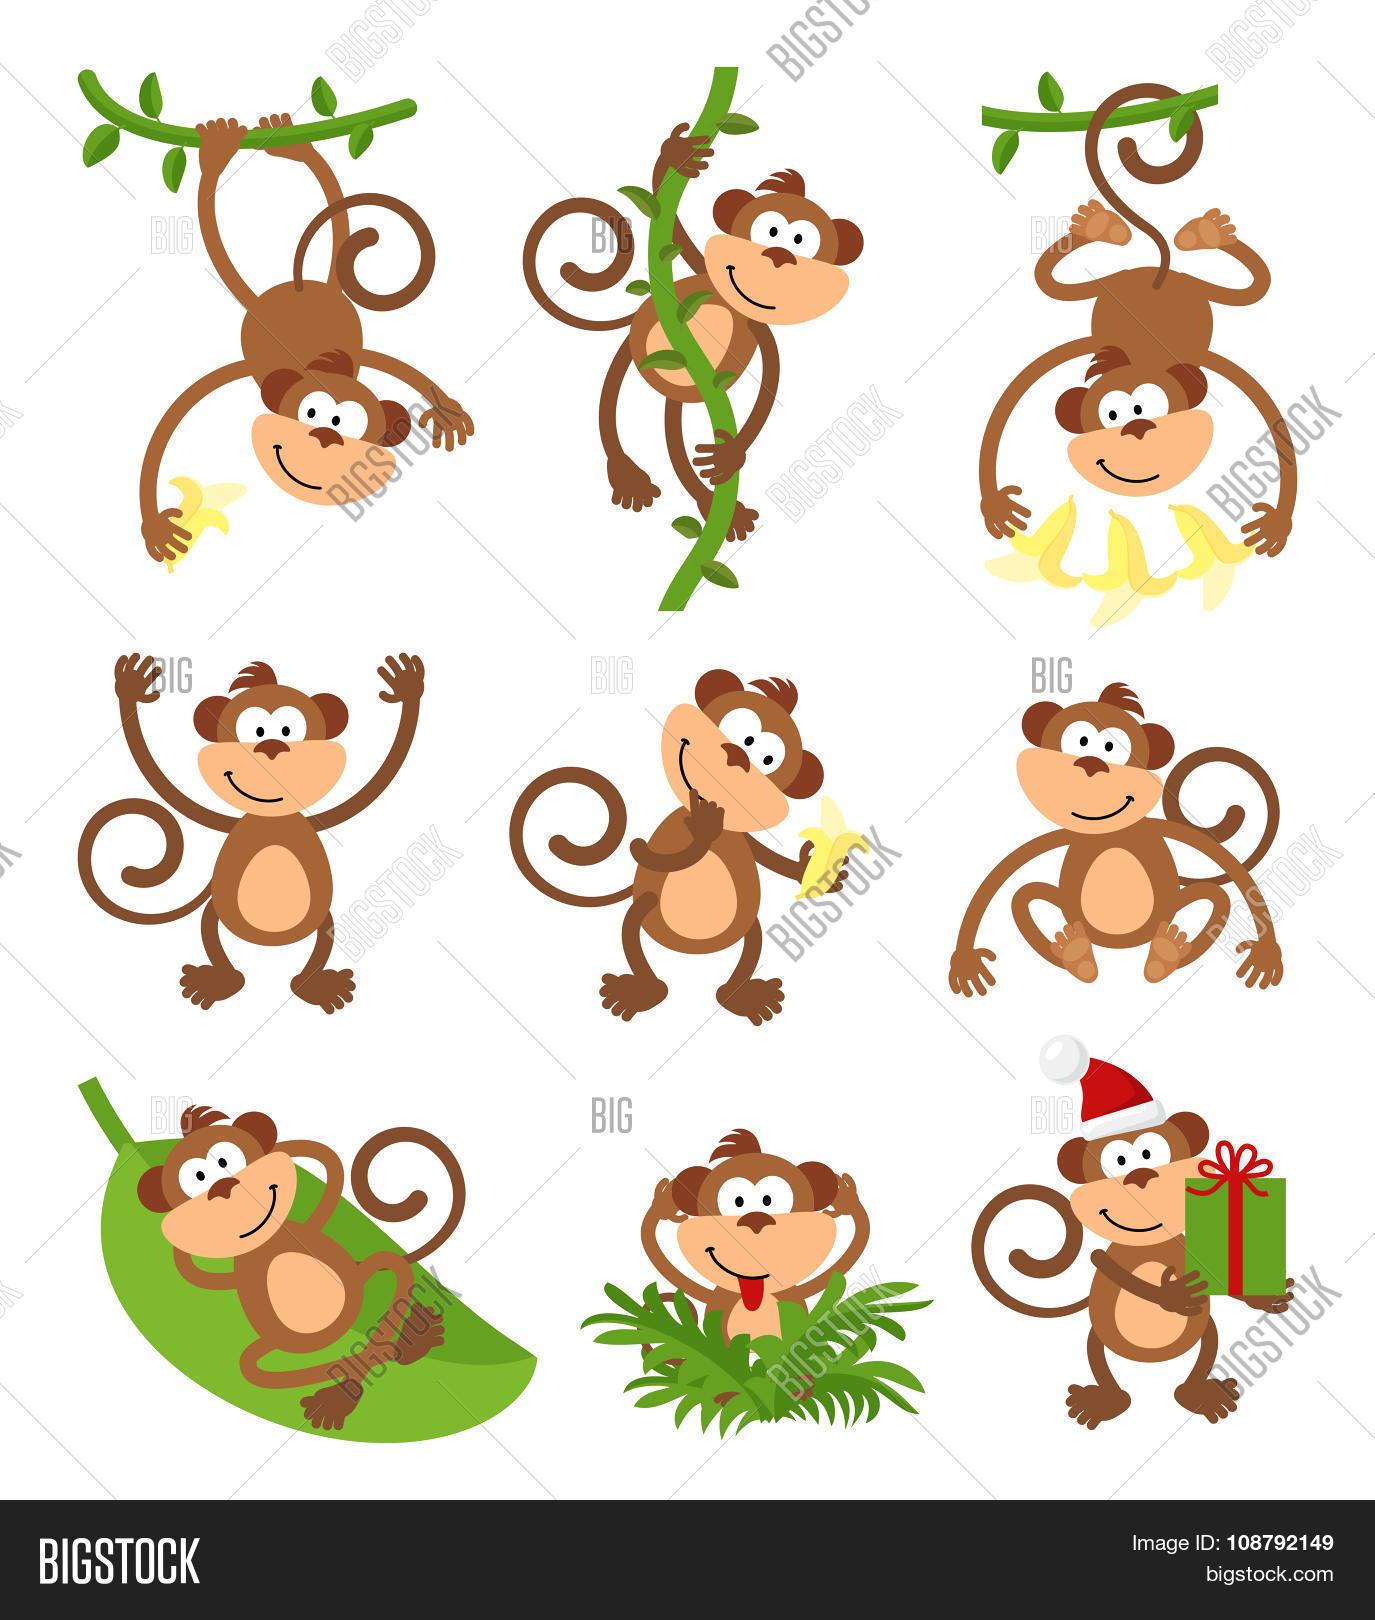 Playful Monkeys Vector Photo Free Trial Bigstock